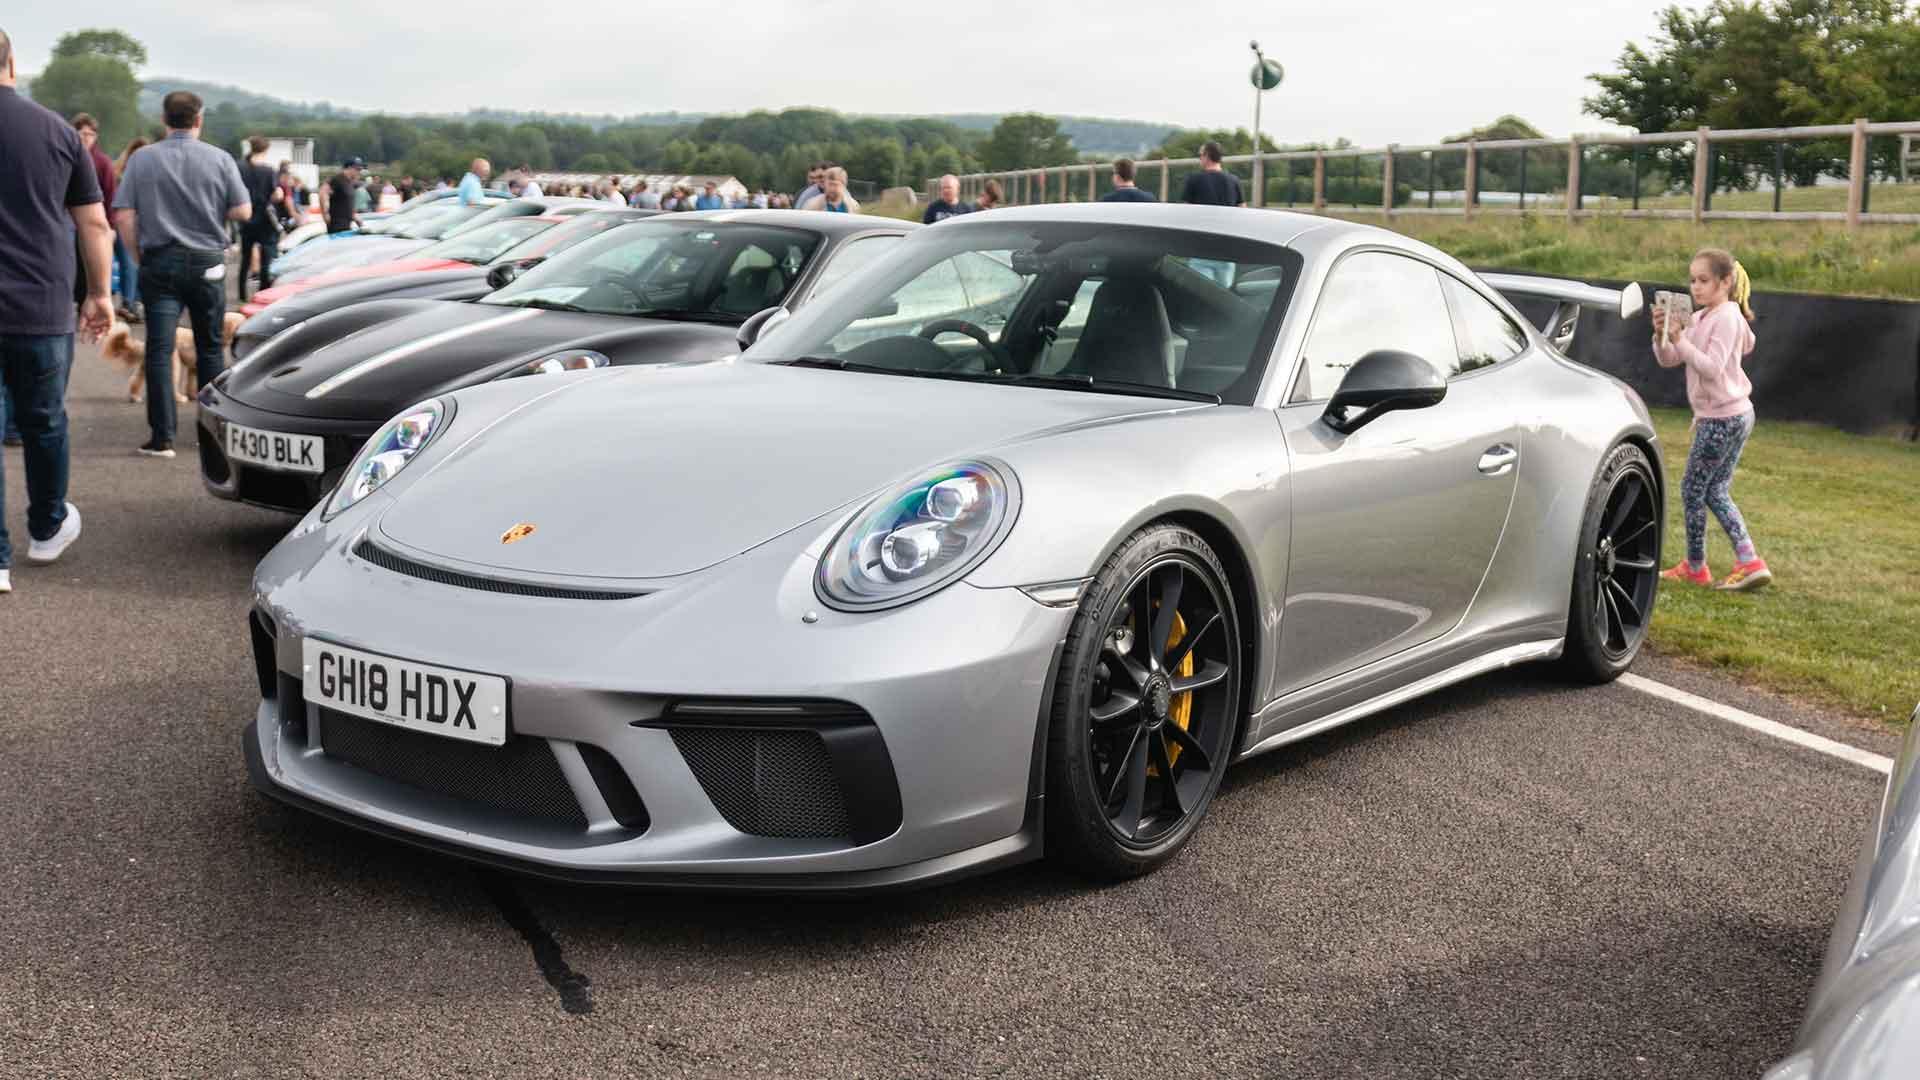 Porsche 911 GT3 at Goodwood Supercar Sunday